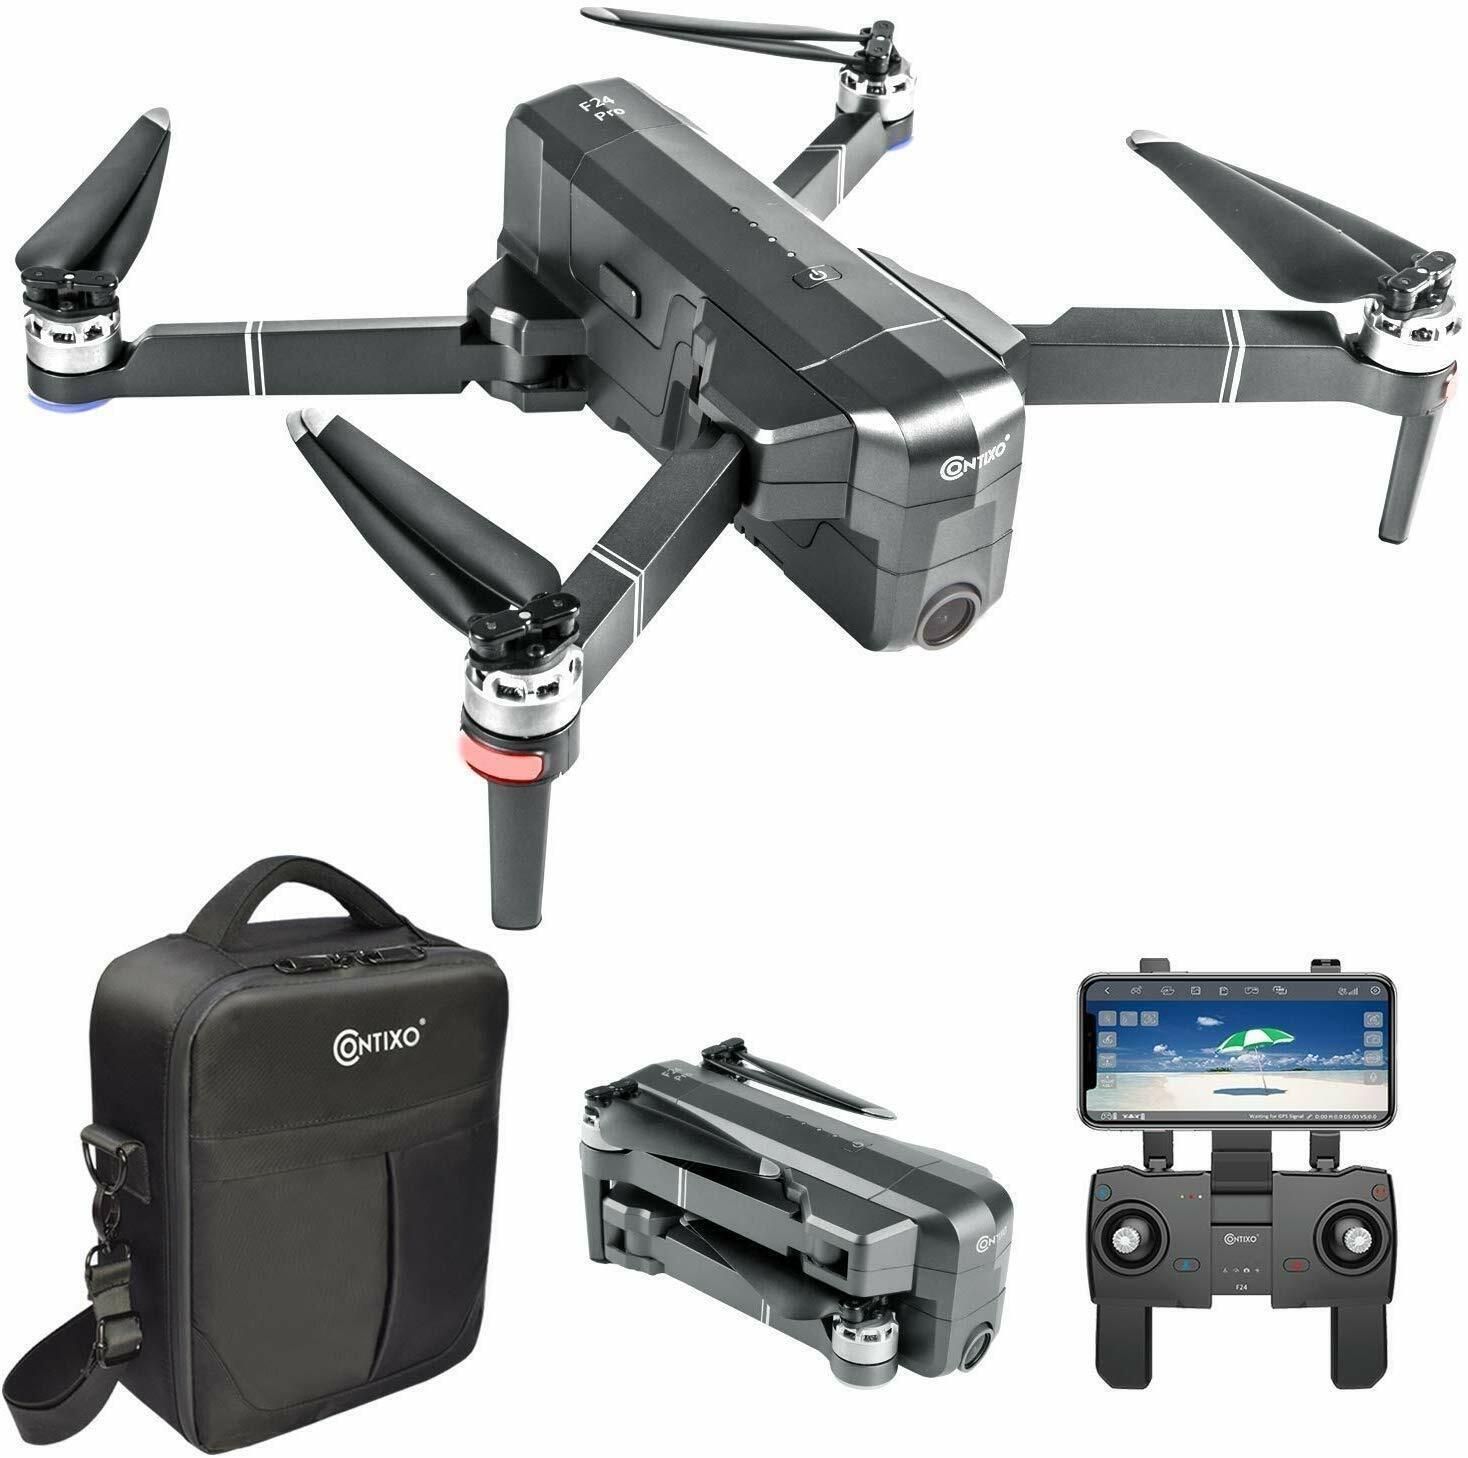 [NEW] Contixo F24-Pro FPV Drones with 4K UHD Camera GPS RC Quadcopter Follow Me